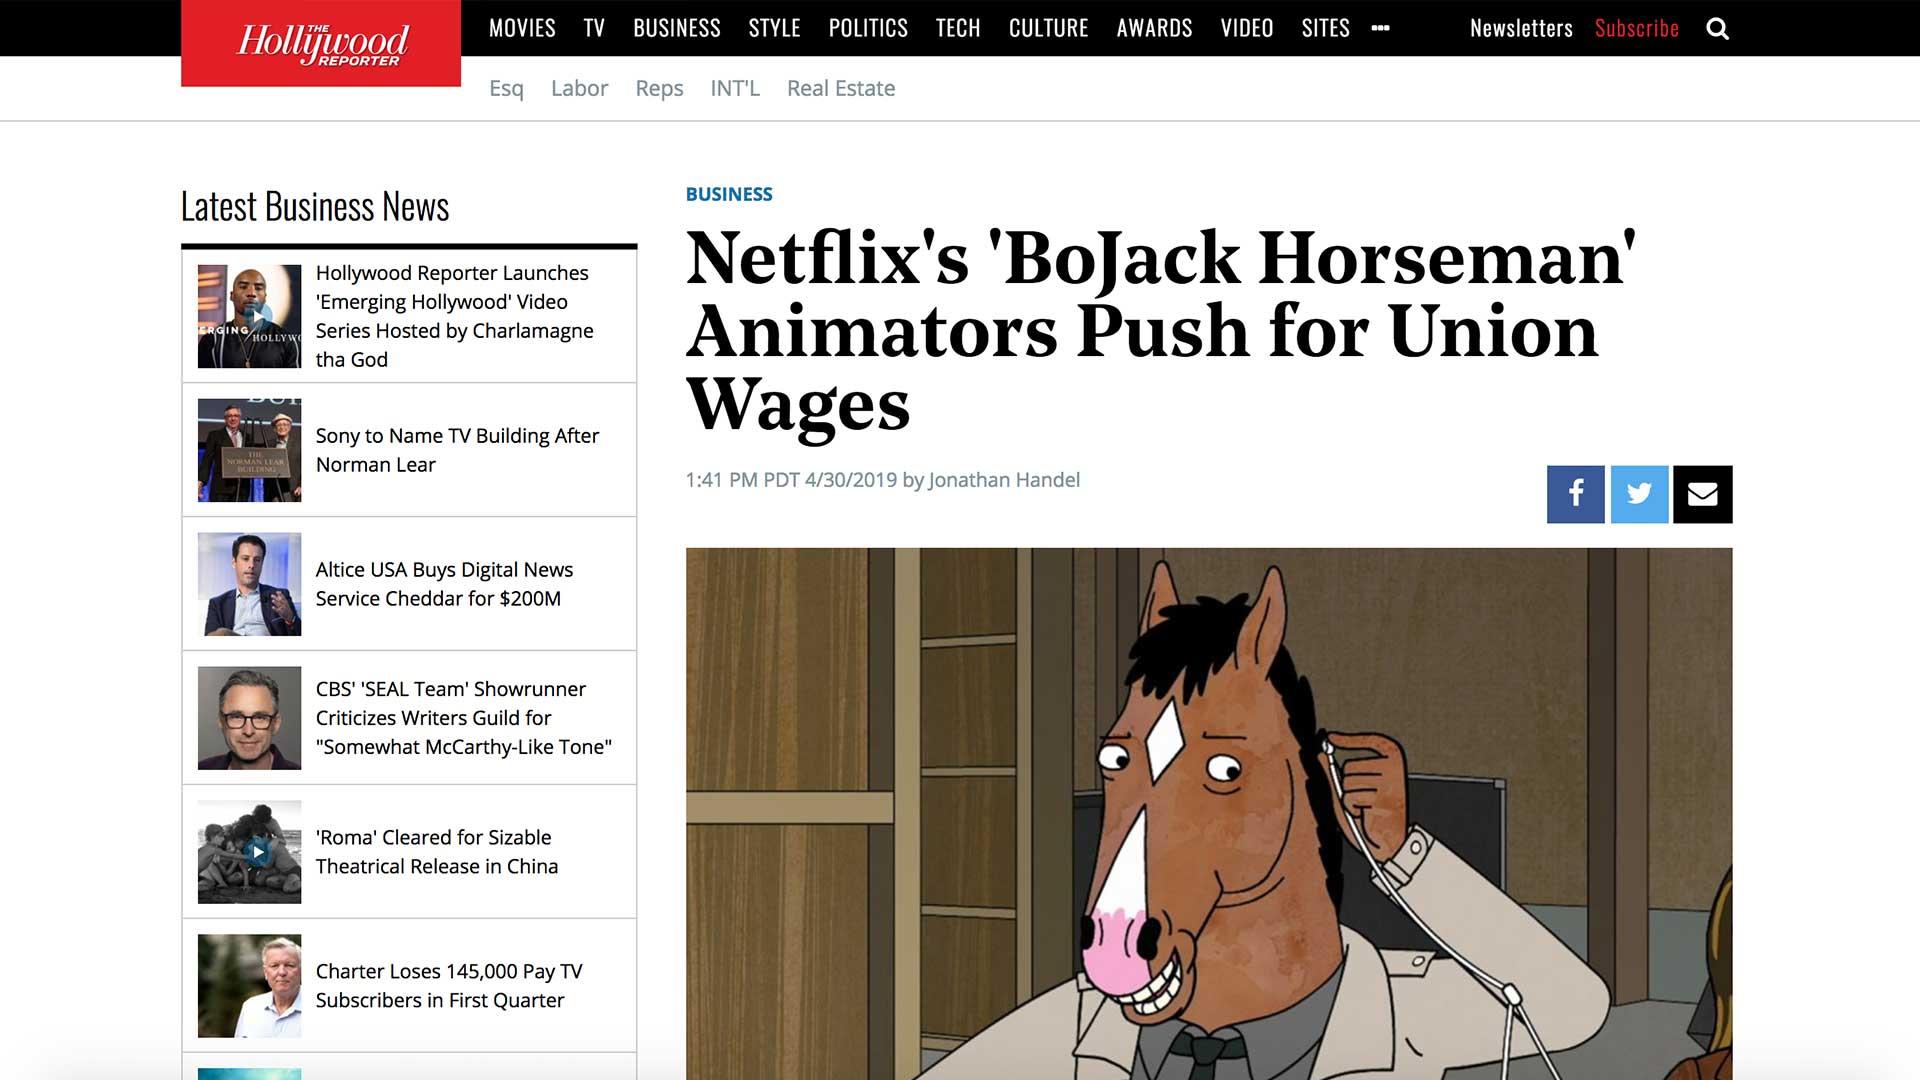 Fairness Rocks News Netflix's 'BoJack Horseman' Animators Push for Union Wages